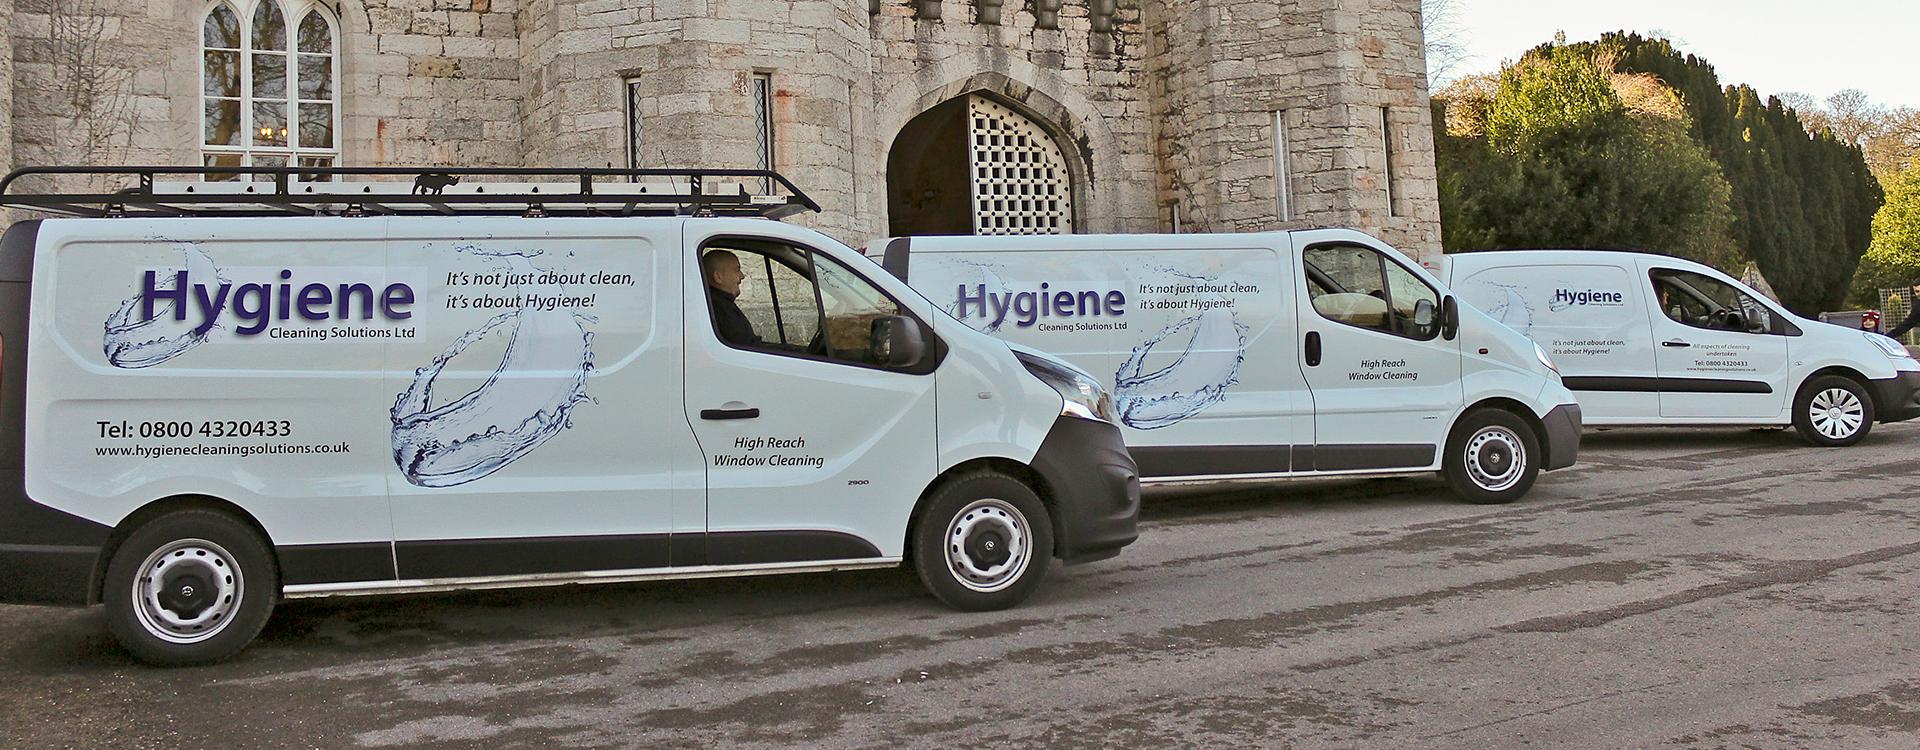 Hygiene Cleaning Vans Image